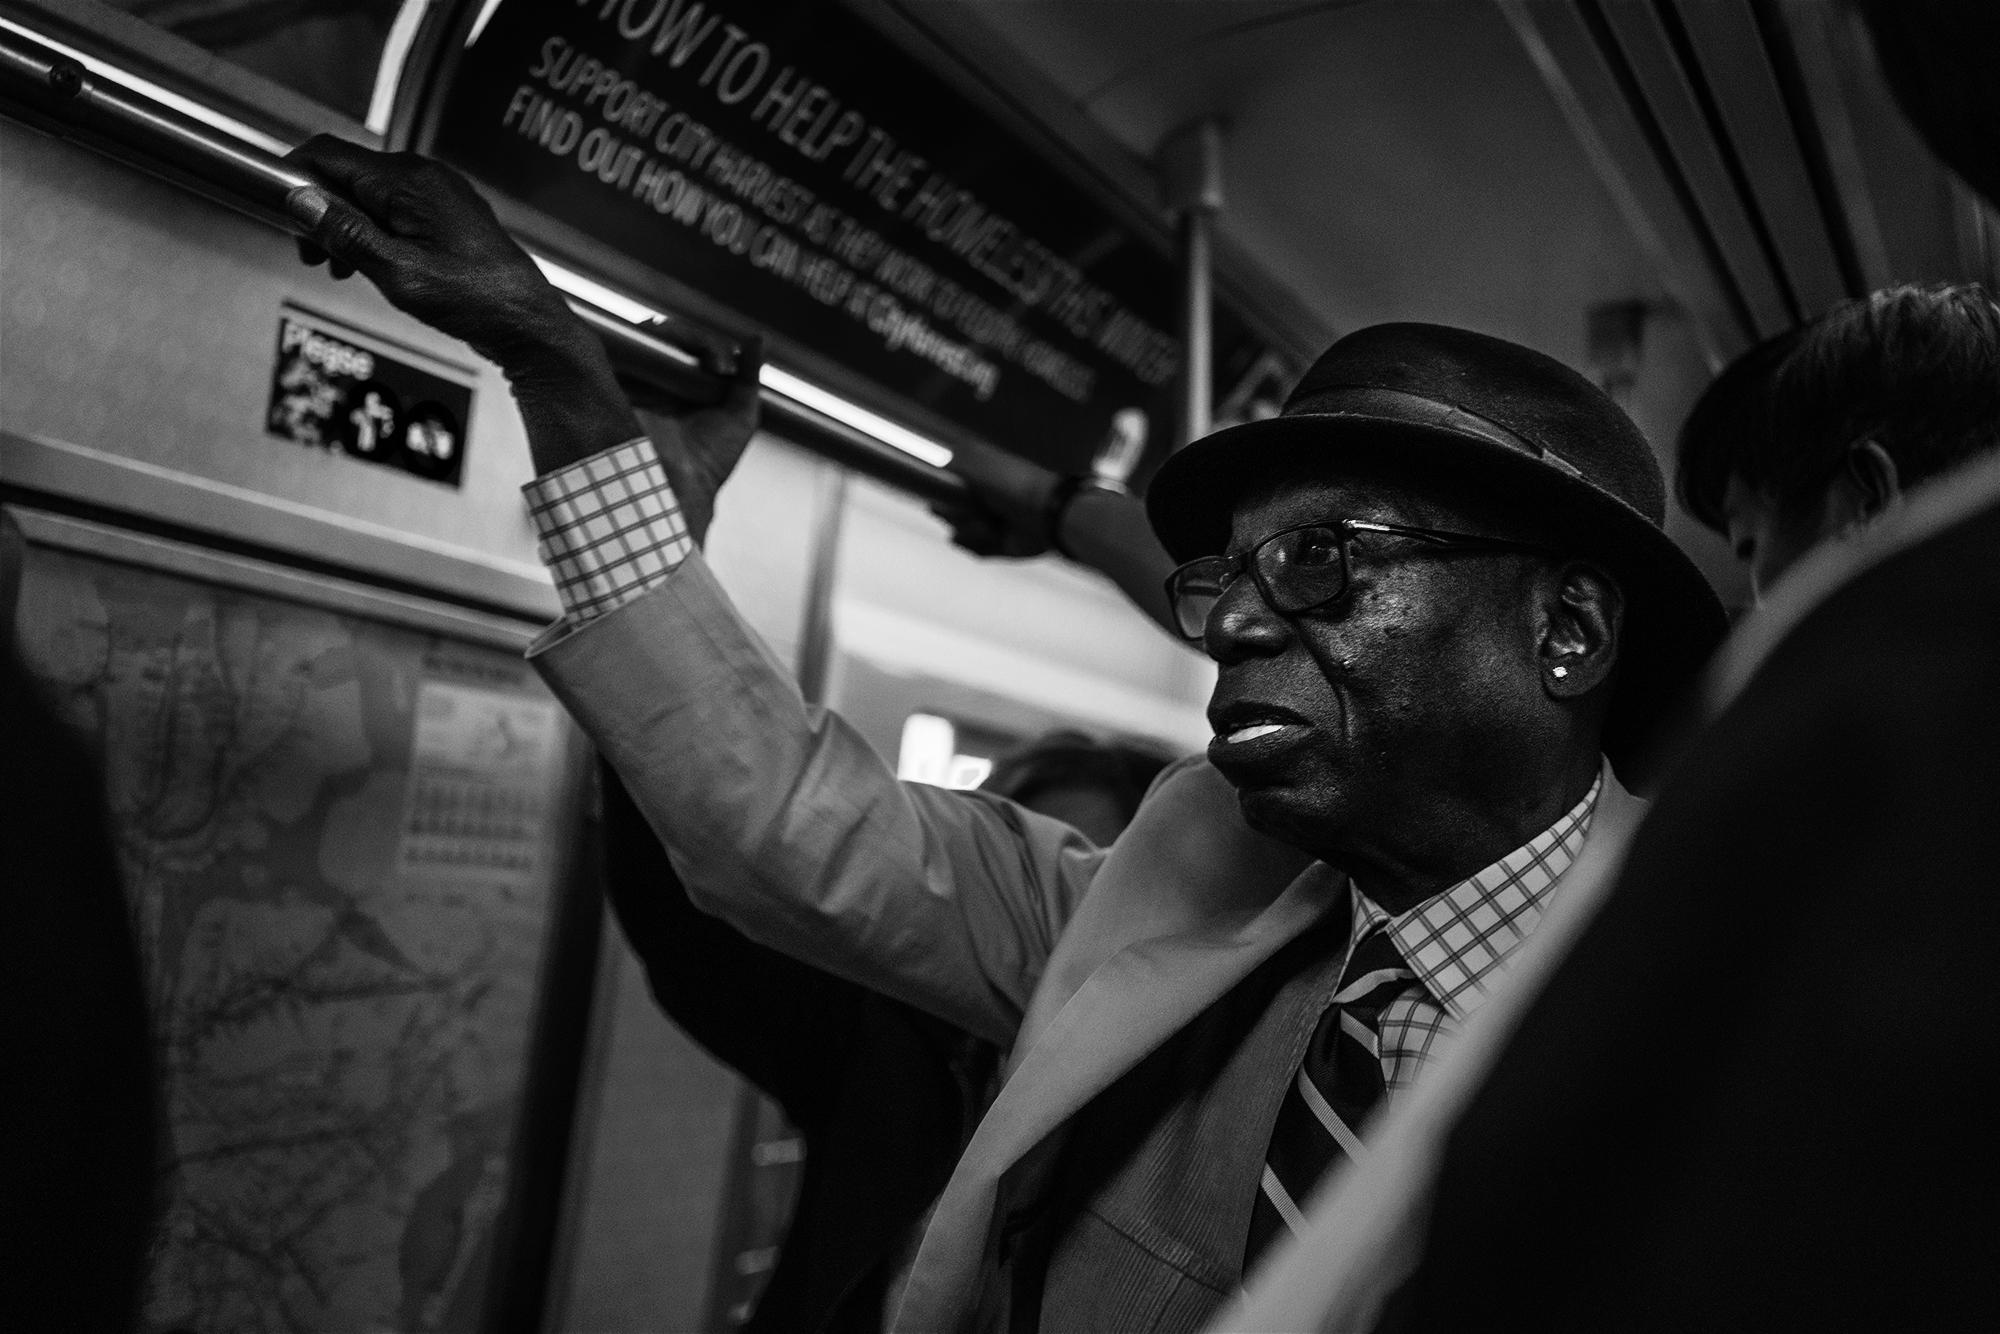 Brklyn_Subway_2018_Old_School_Dressed_Man-001.jpg